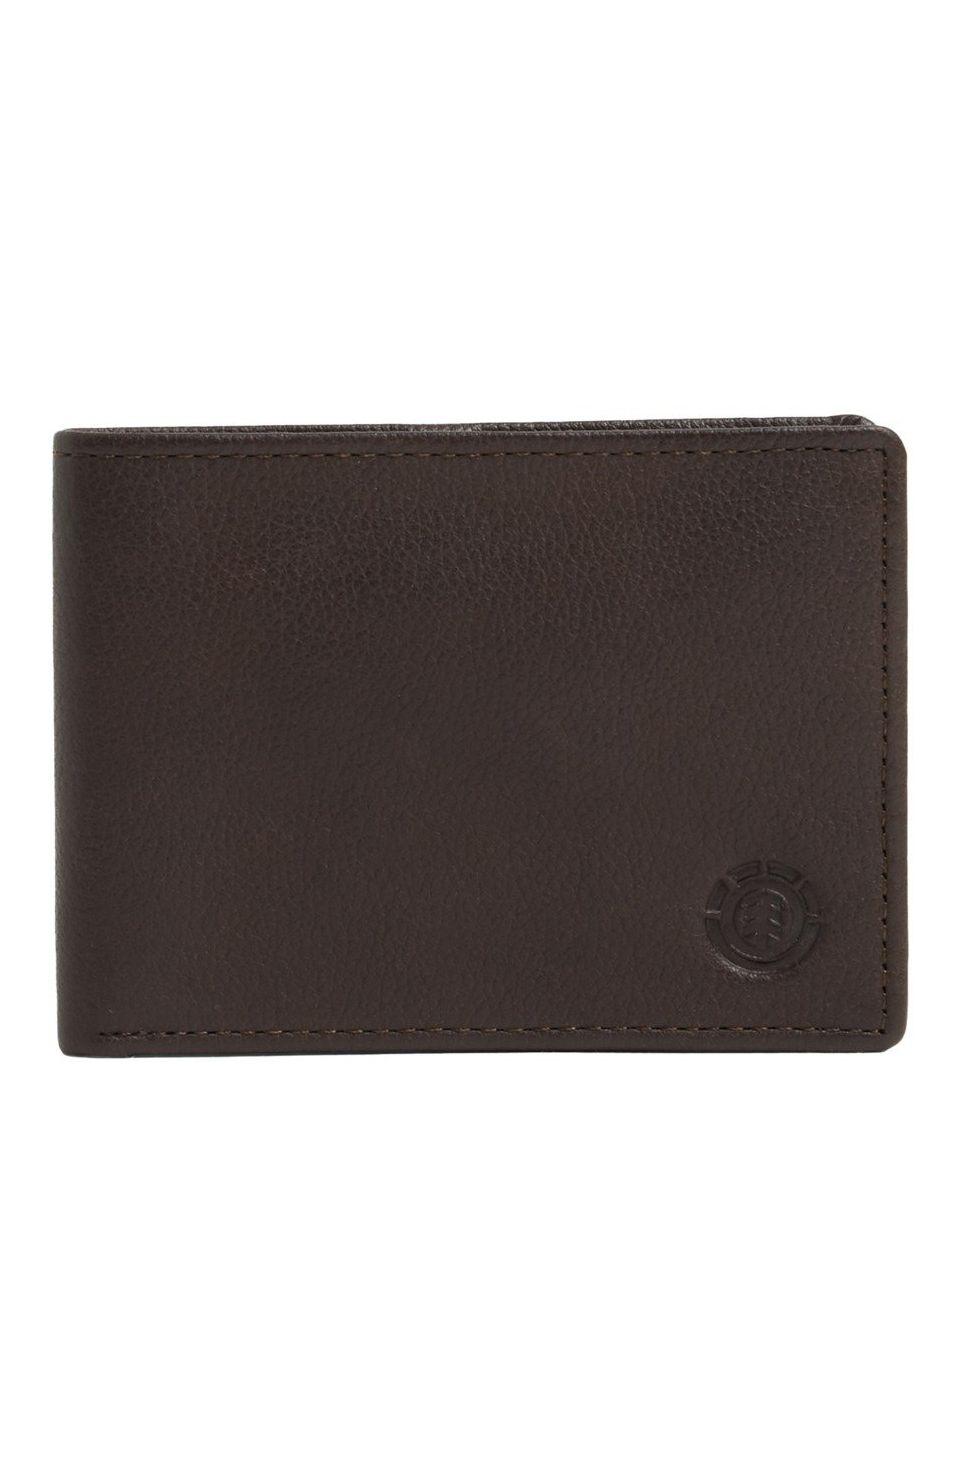 Element Leather Wallet AVENUE WALLET Brown